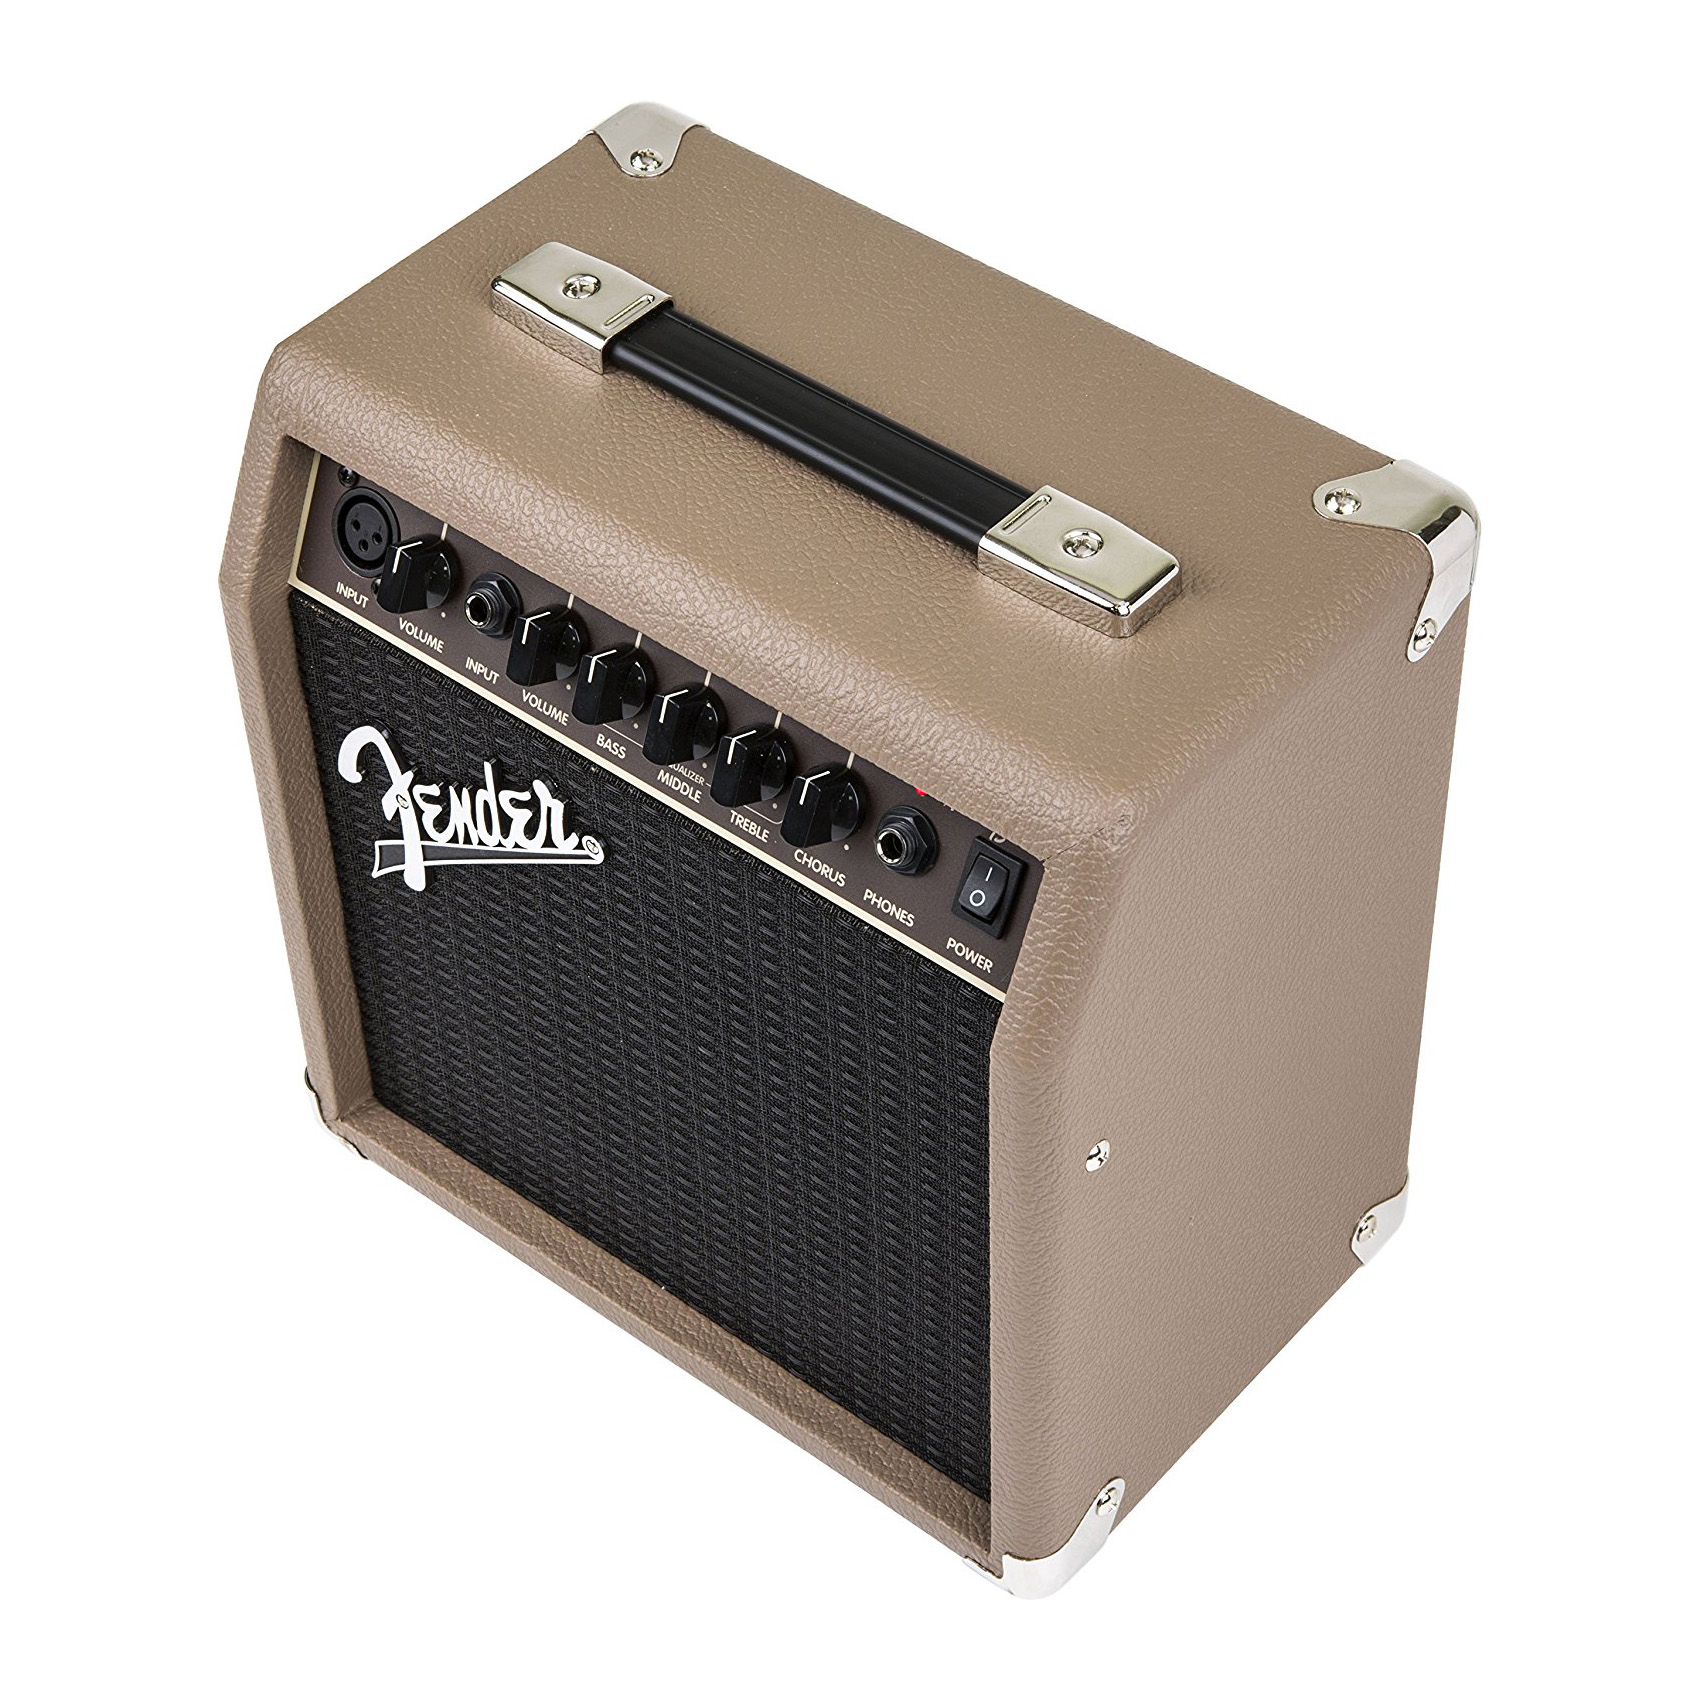 Schemi Elettrici Effetti Per Chitarra : Amplificatore fender acoustasonic per chitarra acustica